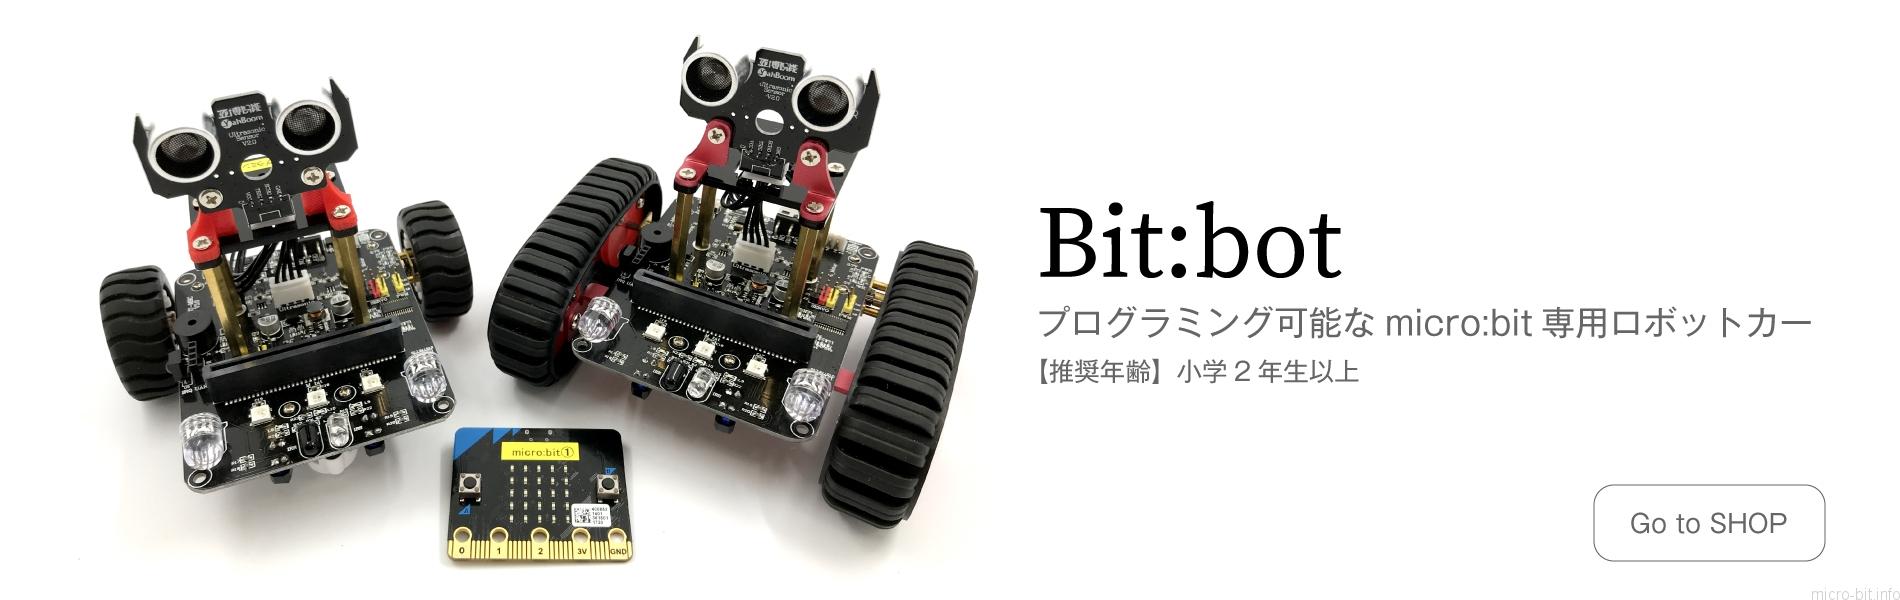 Bit:bot micro:bit専用ロボットカー